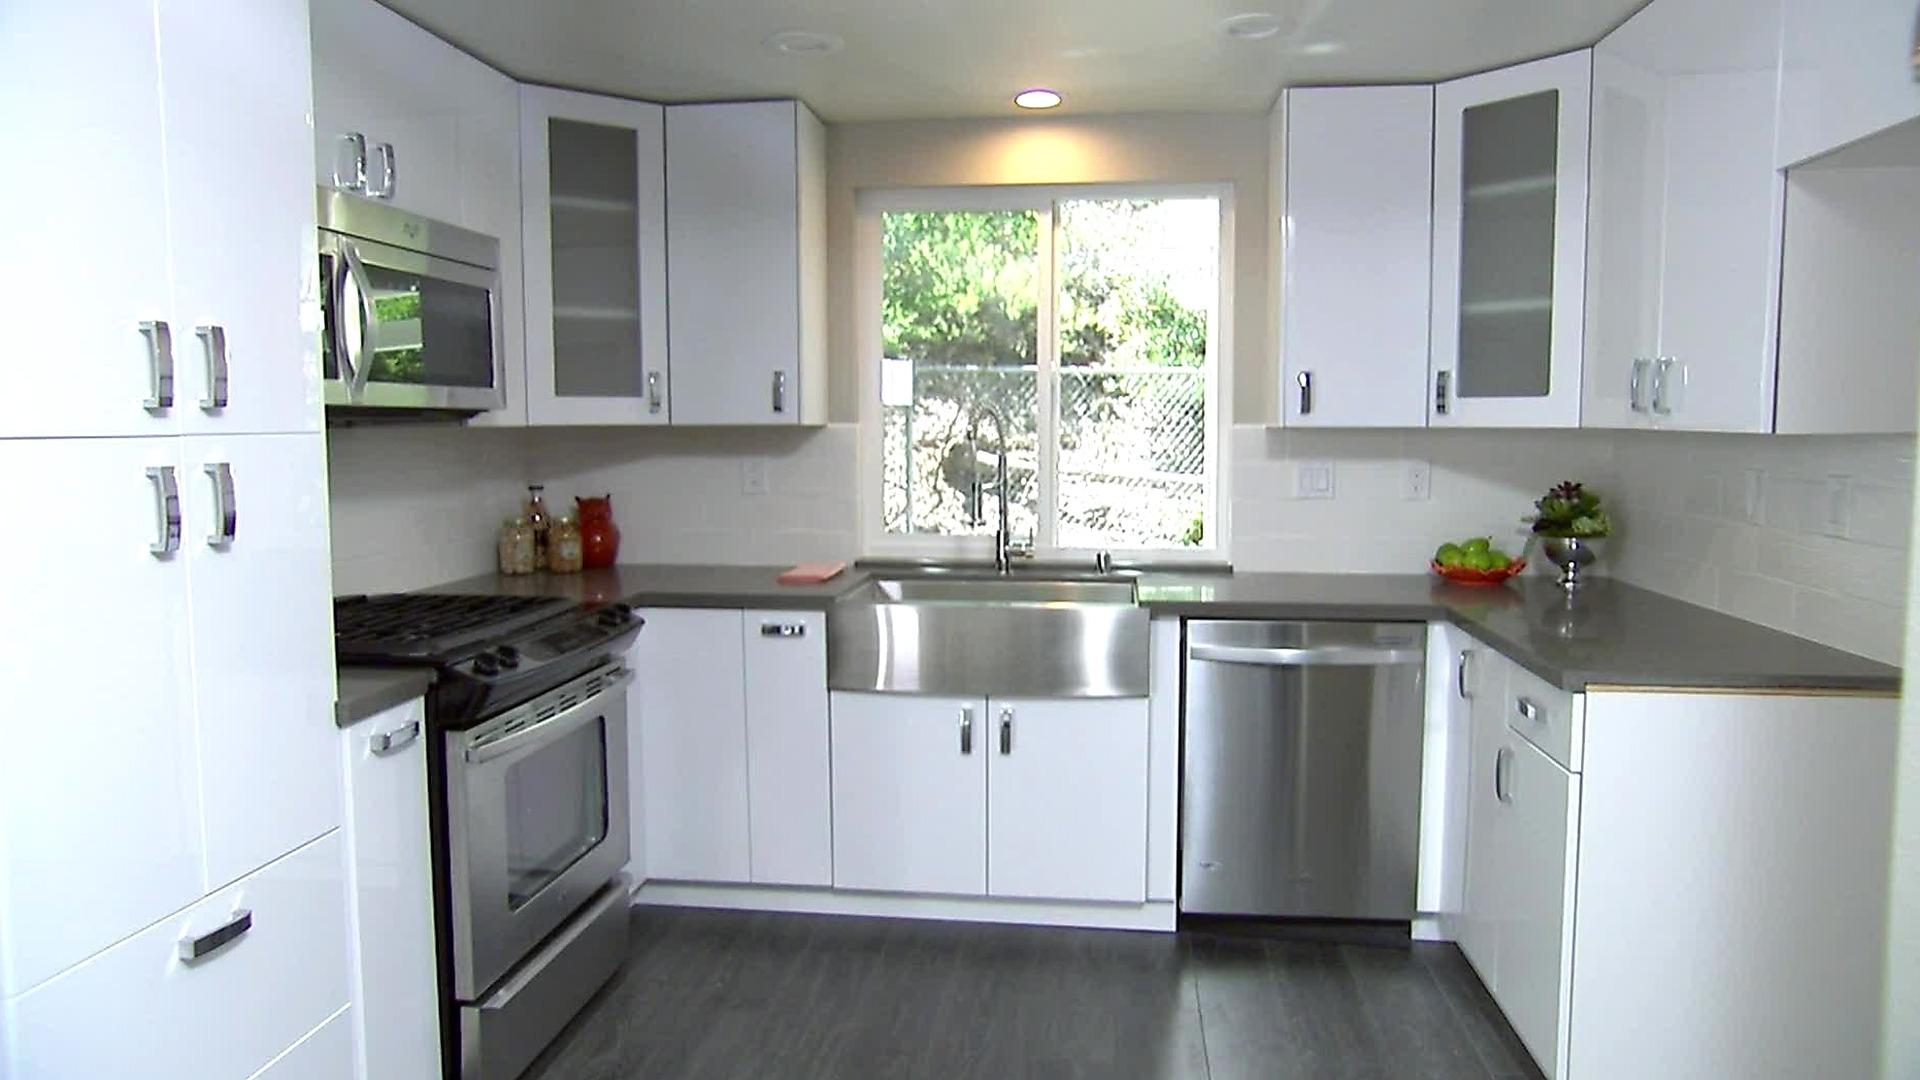 kitchen cabinet ideas with white appliances photo - 6